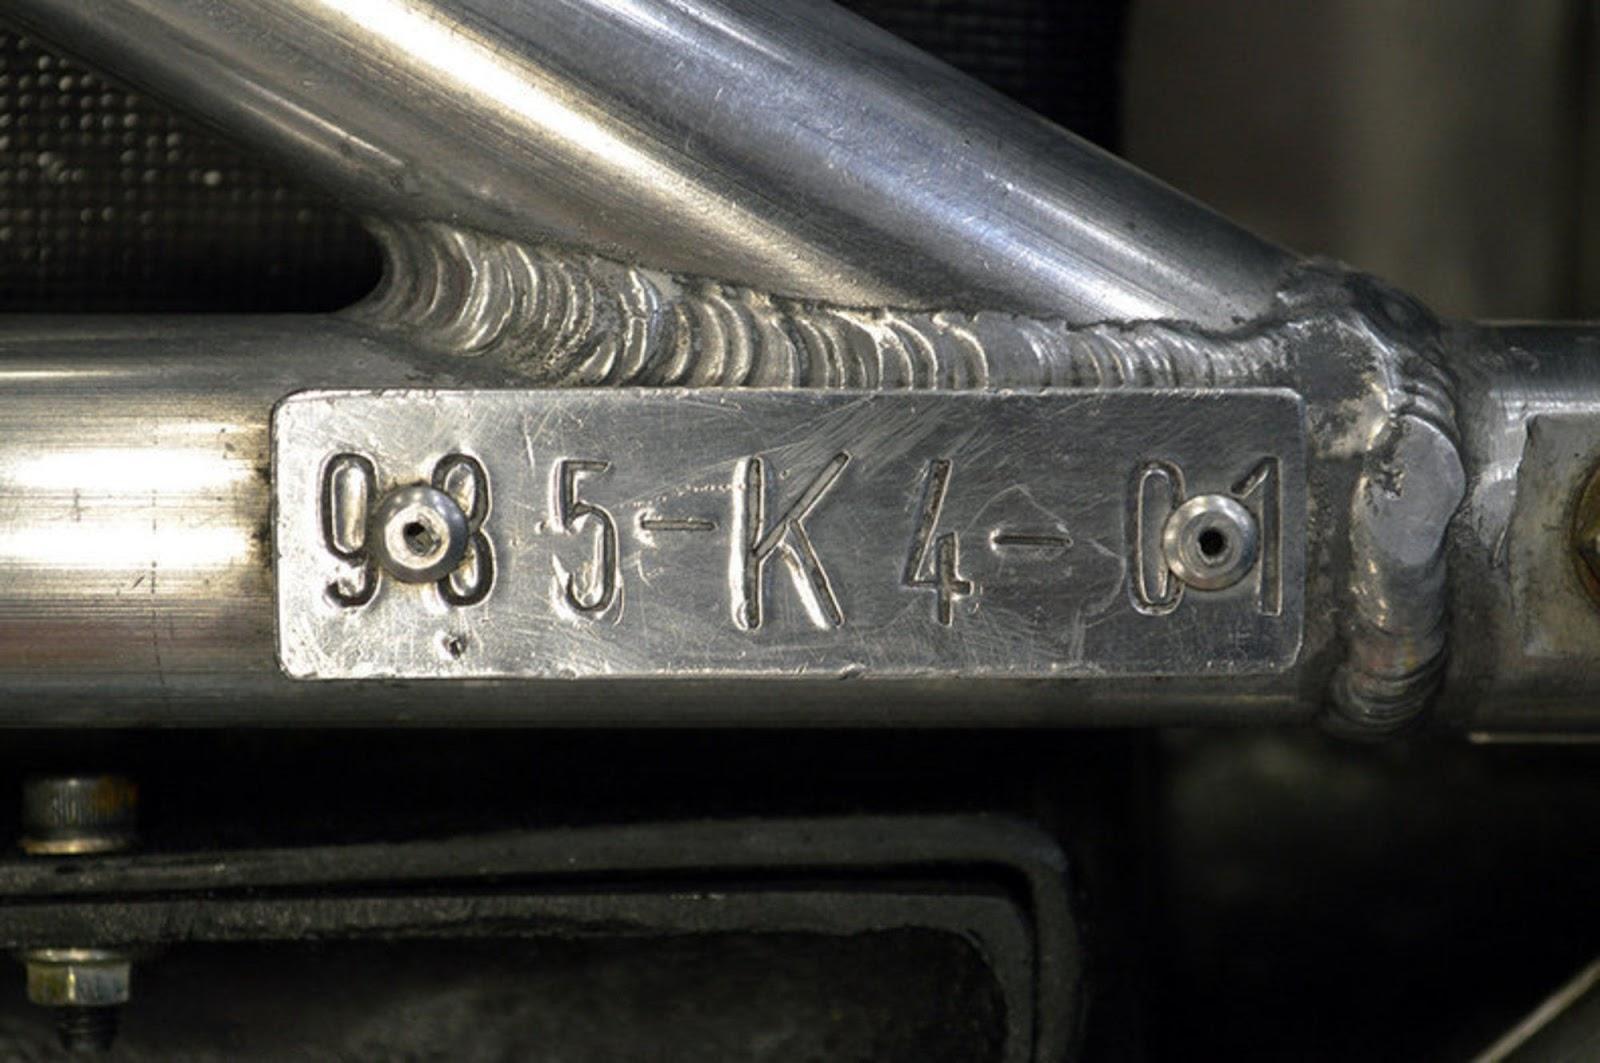 Porsche-935-K4-For-Sale-14